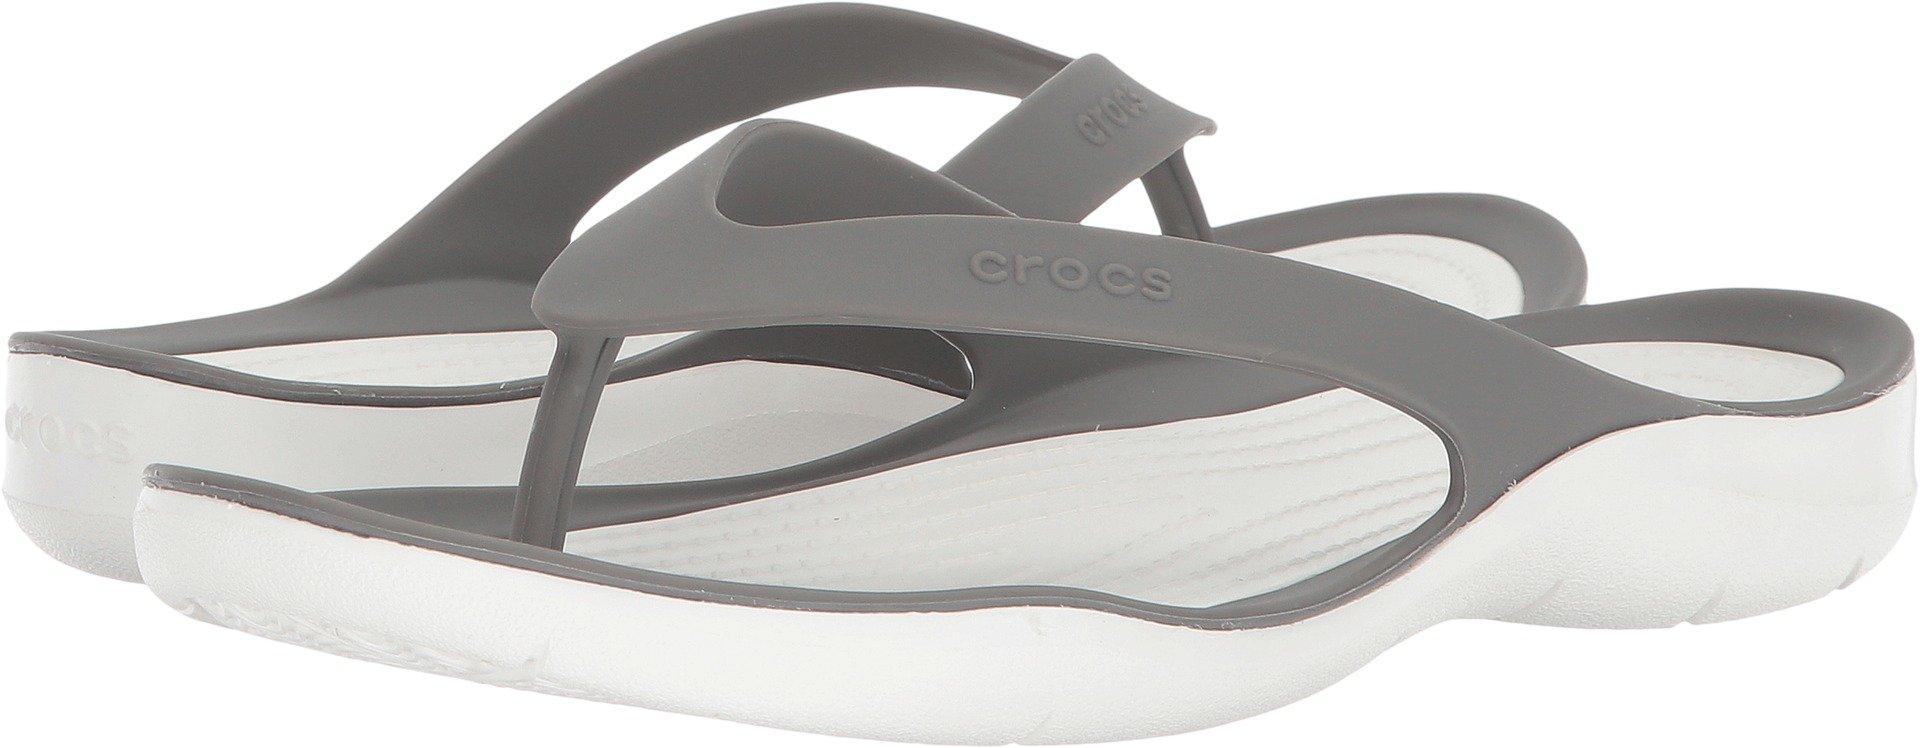 a23a844b82edf Crocs Women s Swiftwater Flip-Flop